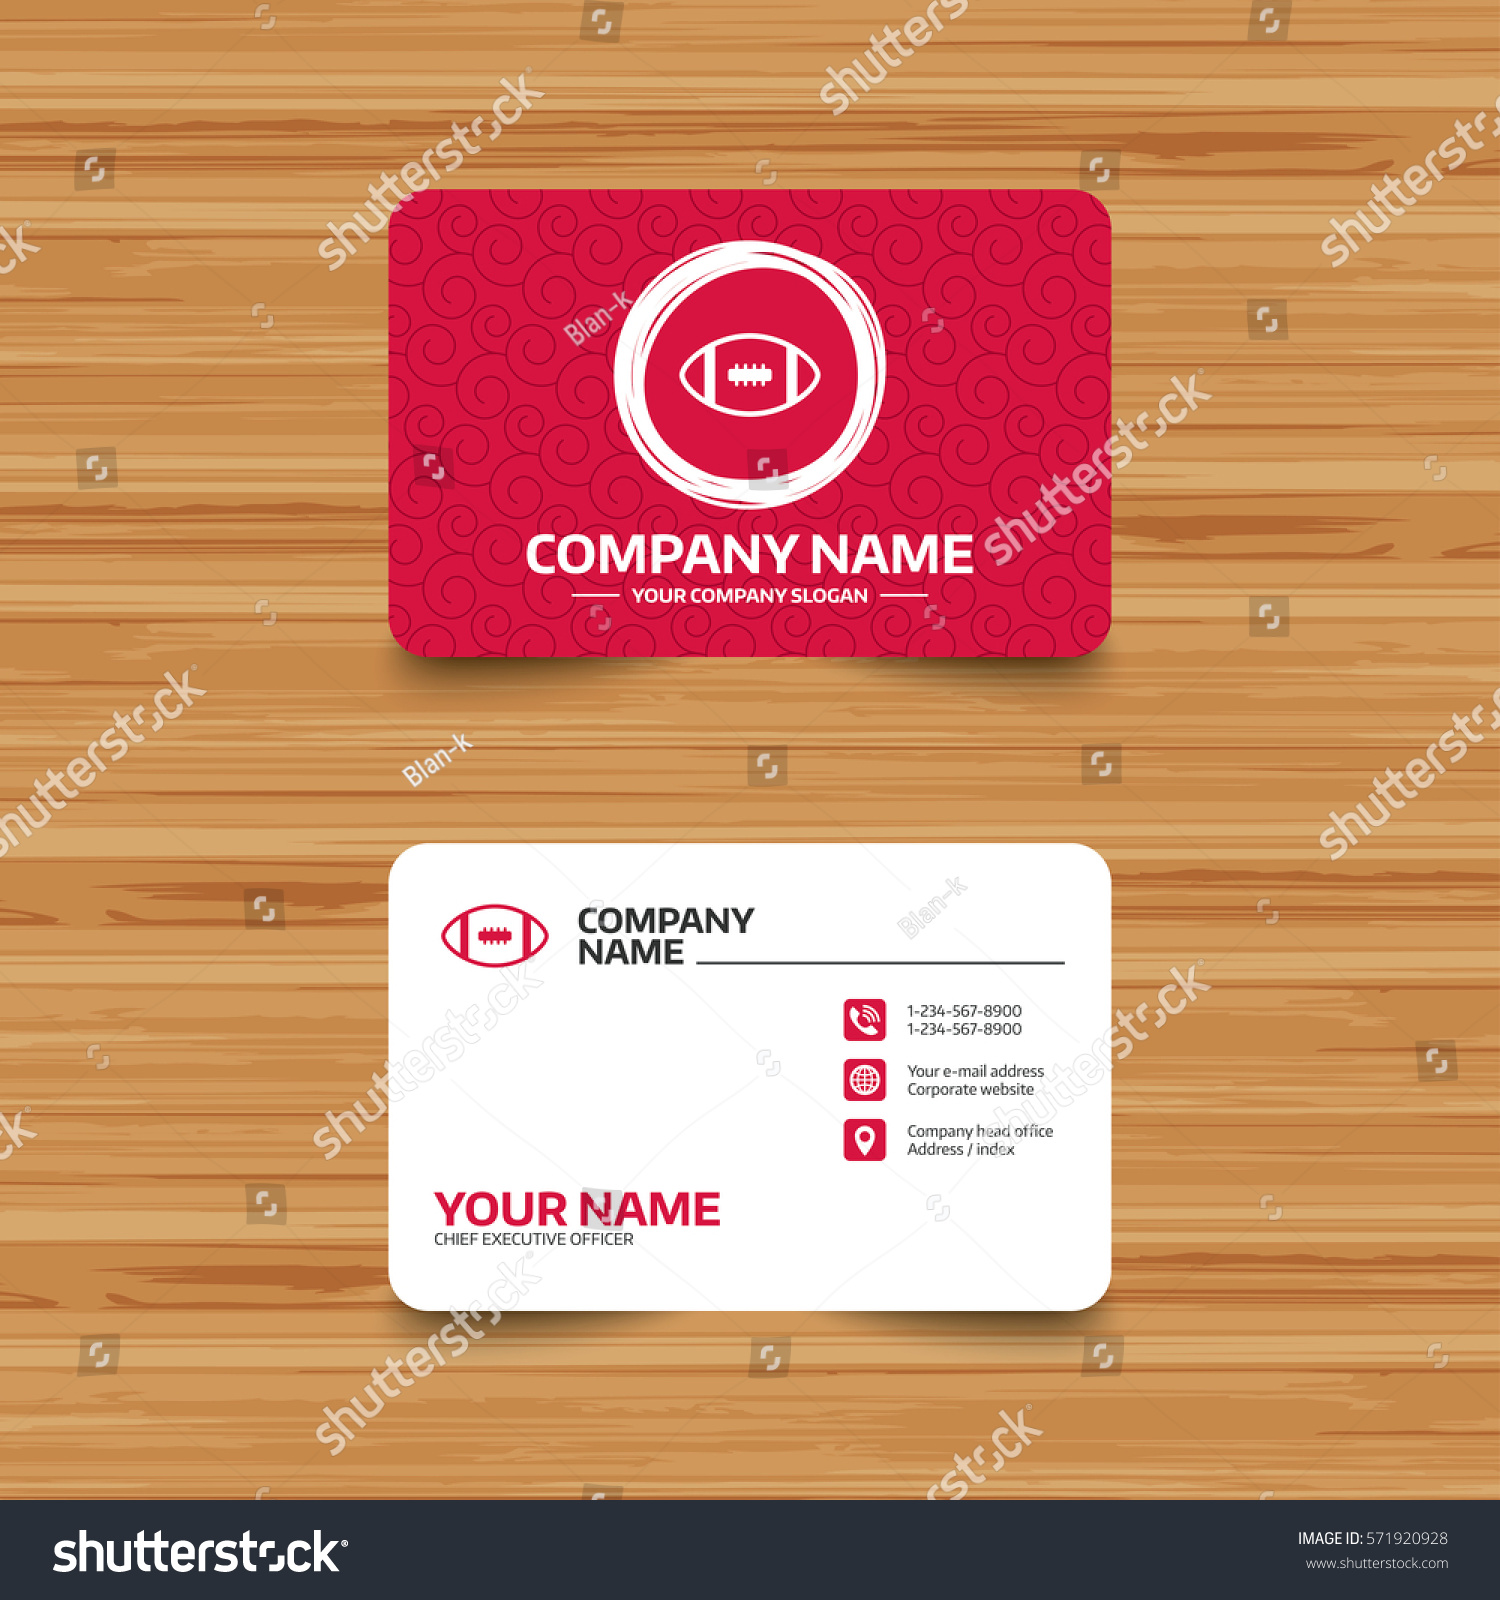 Business card template texture american football stock illustration business card template texture american football stock illustration 571920928 shutterstock colourmoves